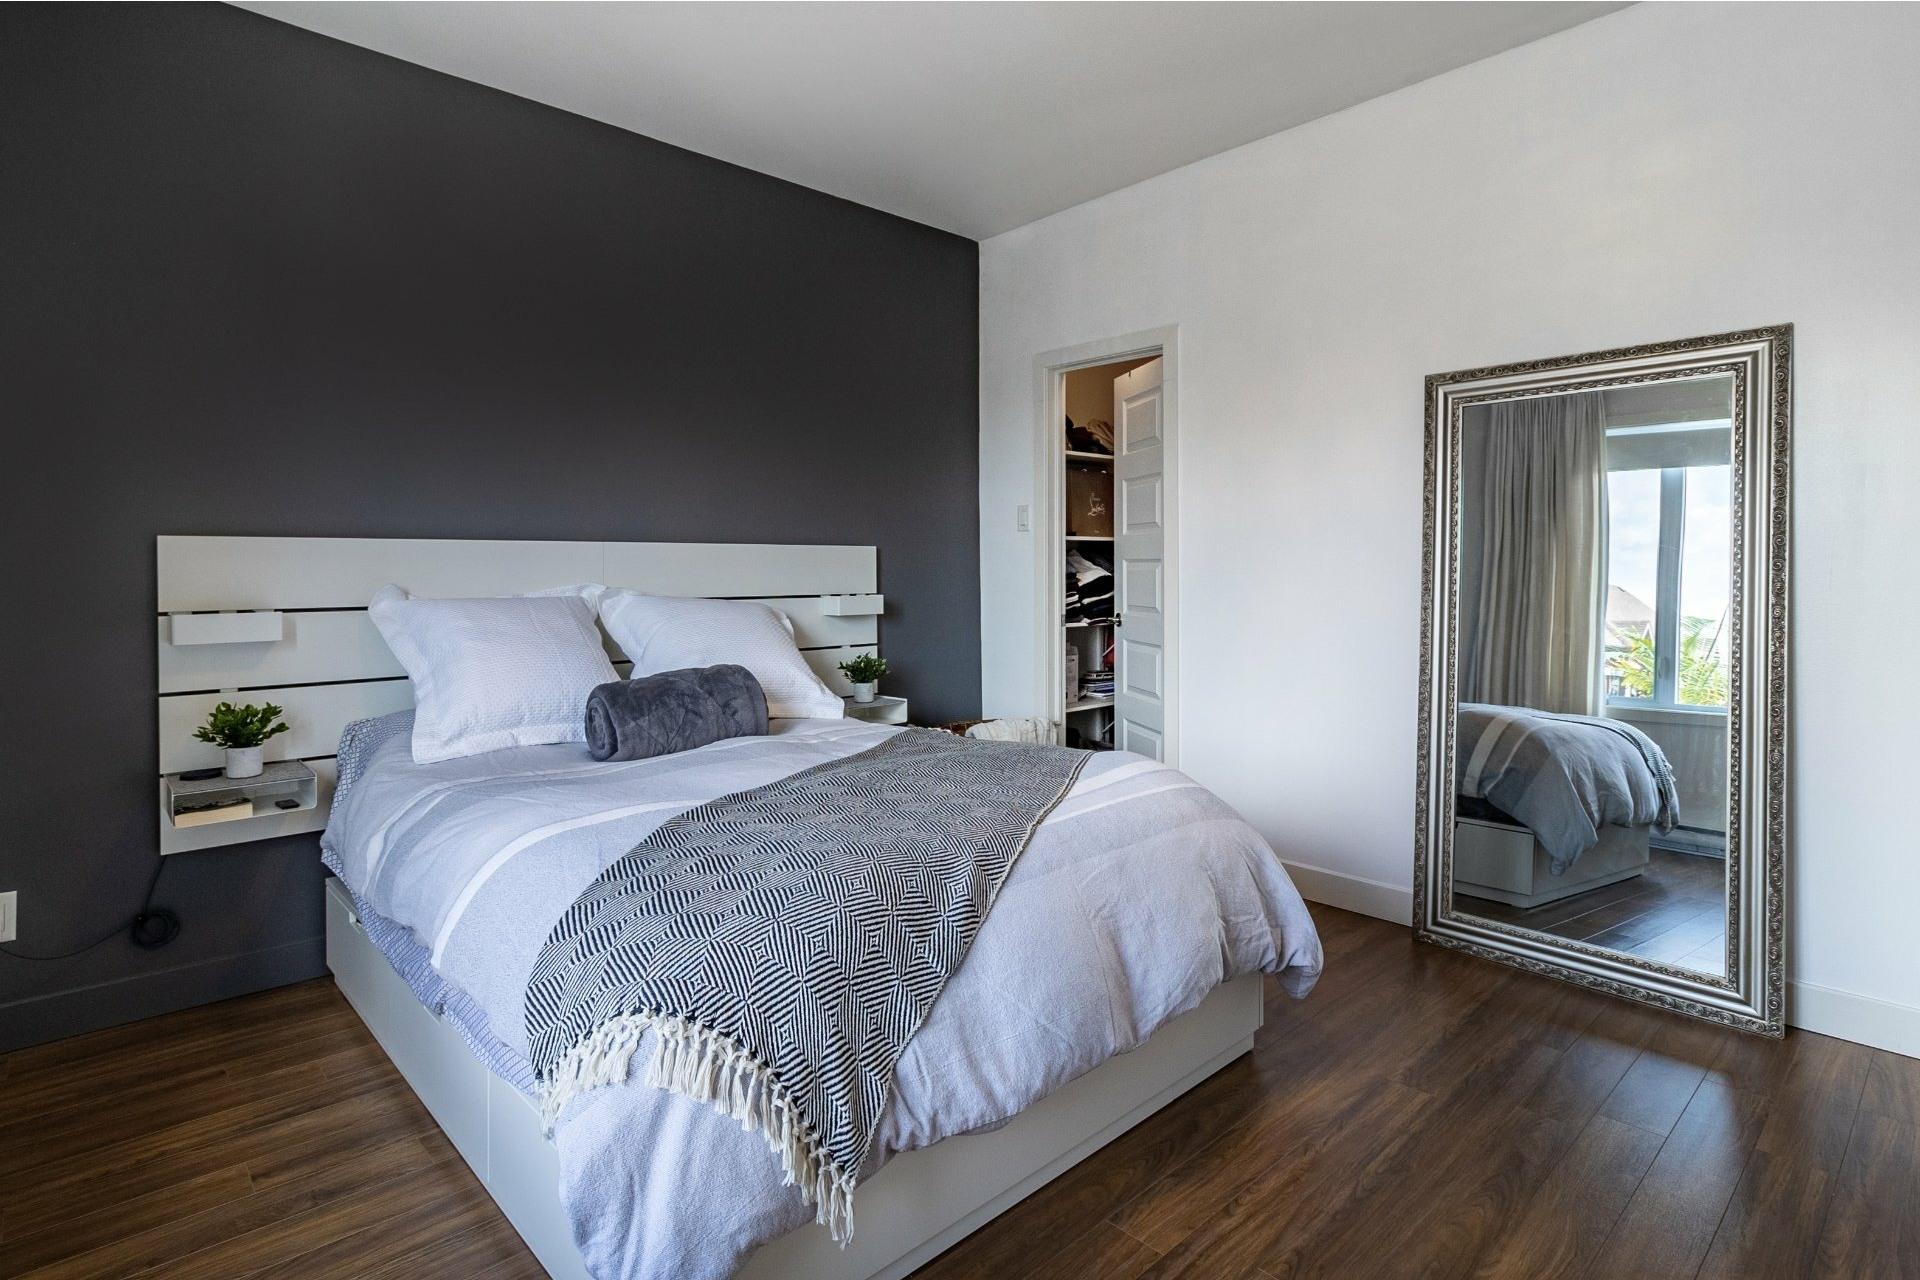 image 16 - Apartment For sale Saint-Hubert Longueuil  - 7 rooms